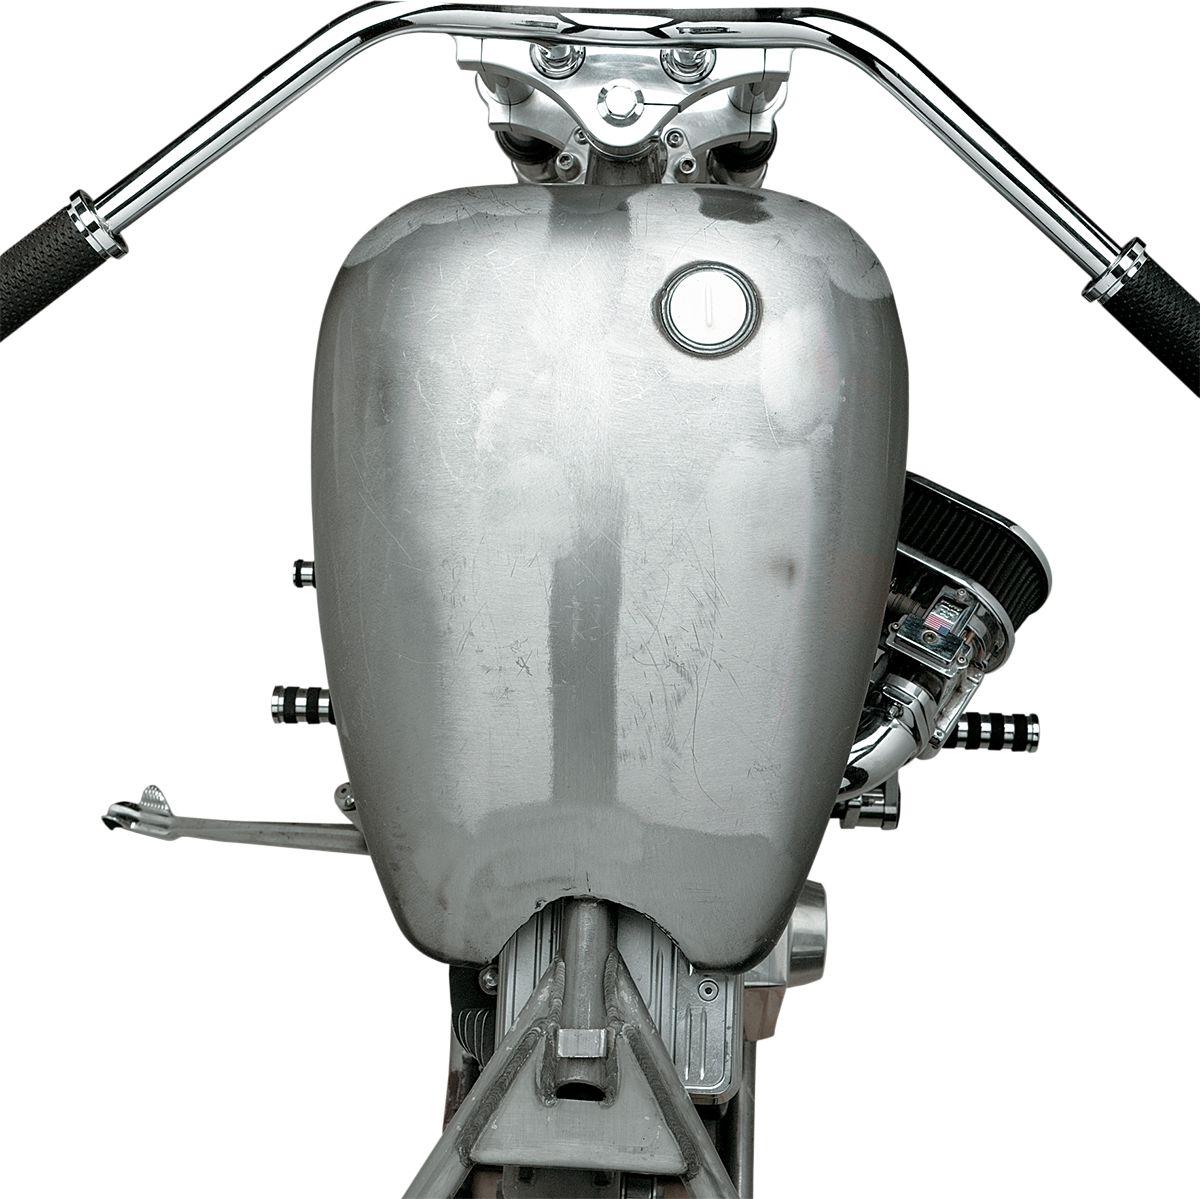 【Drag Specialties】油箱/ 單螺牙蓋 【1 PCE EXT 1 SCREW IN BUNG [DS-390071]】 - 「Webike-摩托百貨」